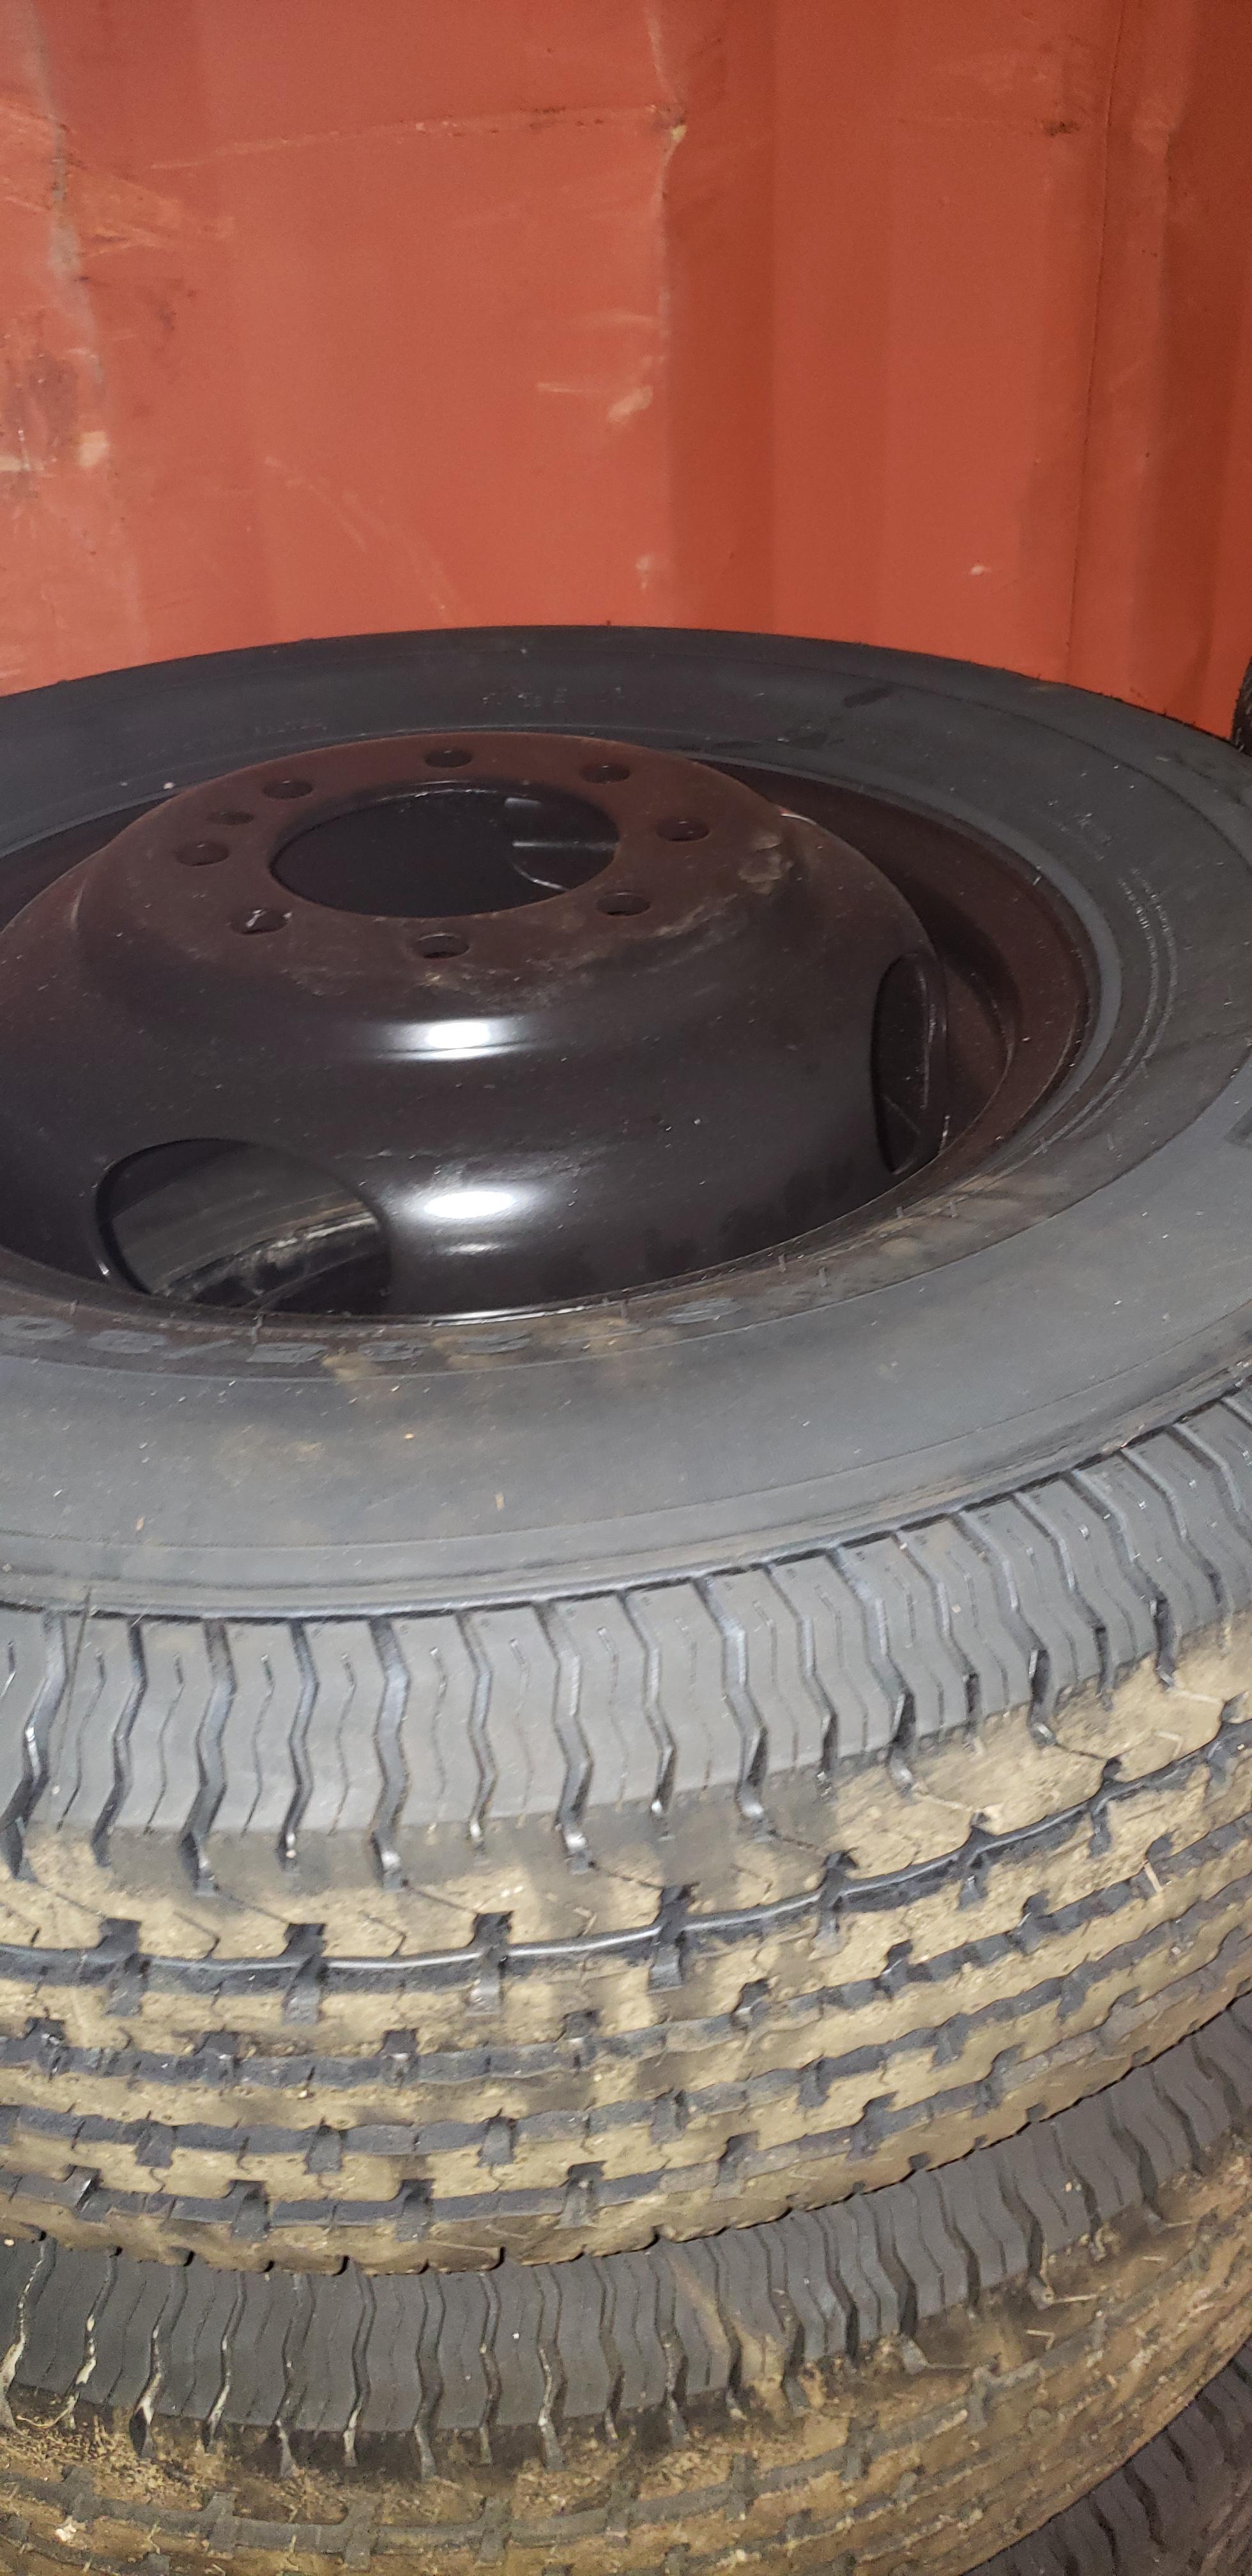 ST235/80R16 Goodride Dually- Black- Rim and Wheel